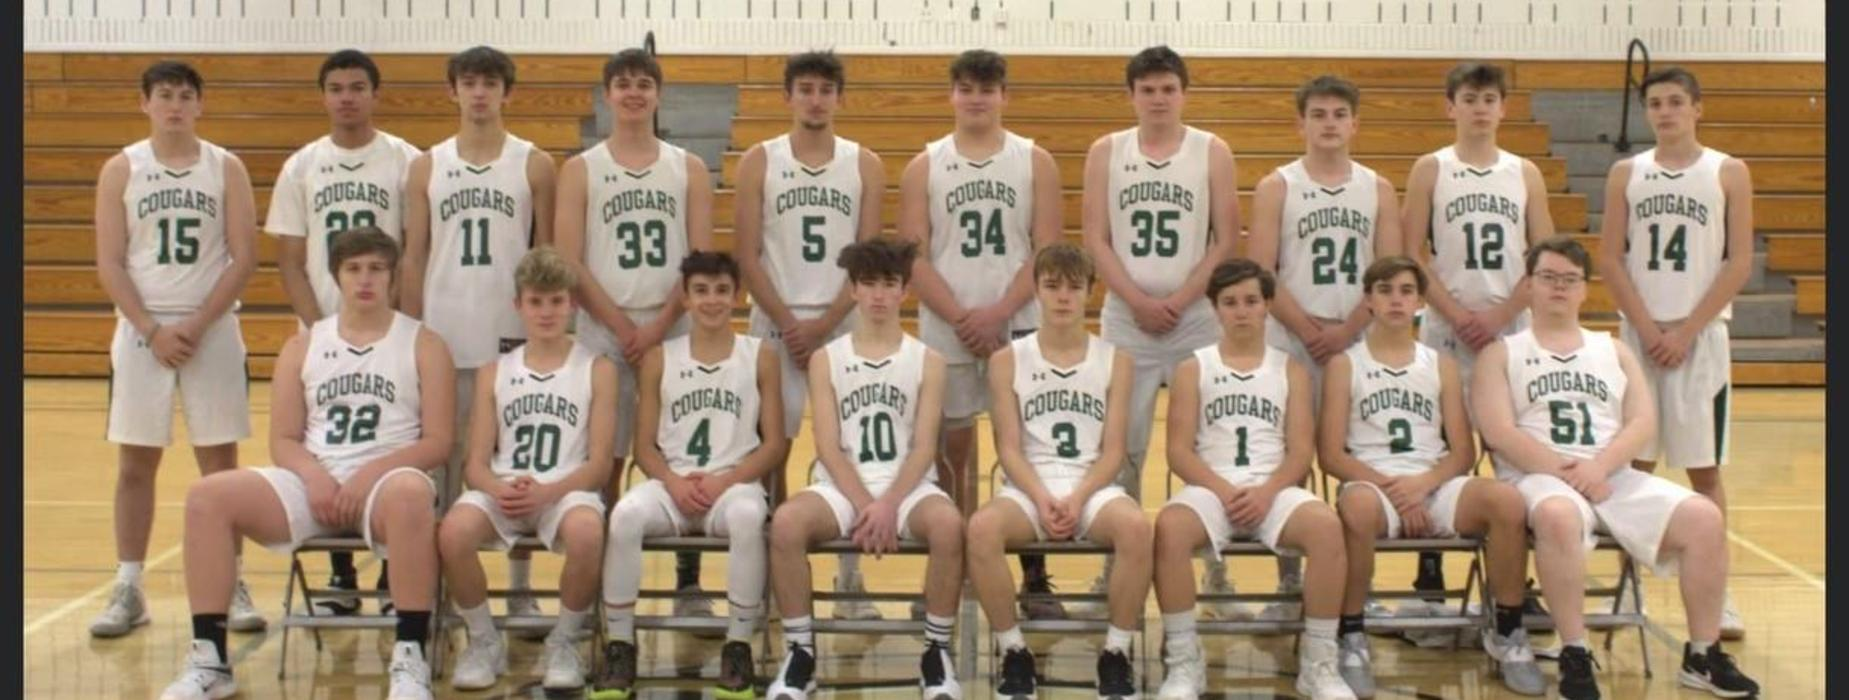 2020-2021 Boys Basketball Team